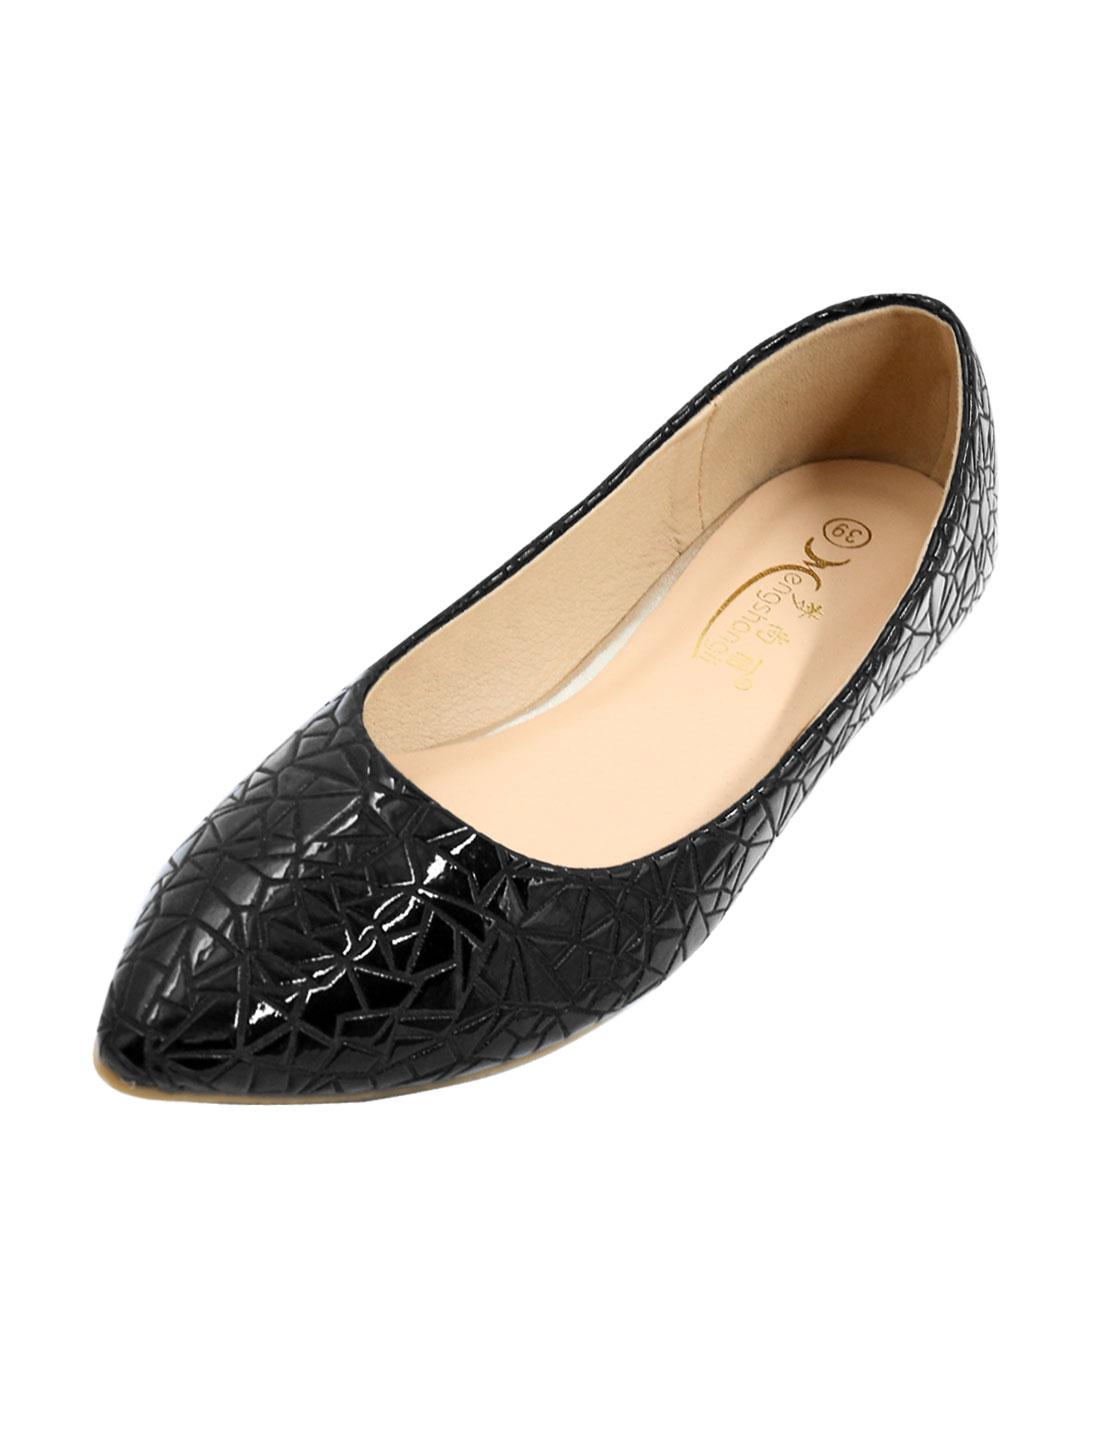 Ladies Point Toe Crocodile Effect PU Leather Casual Flats Black US 8.5